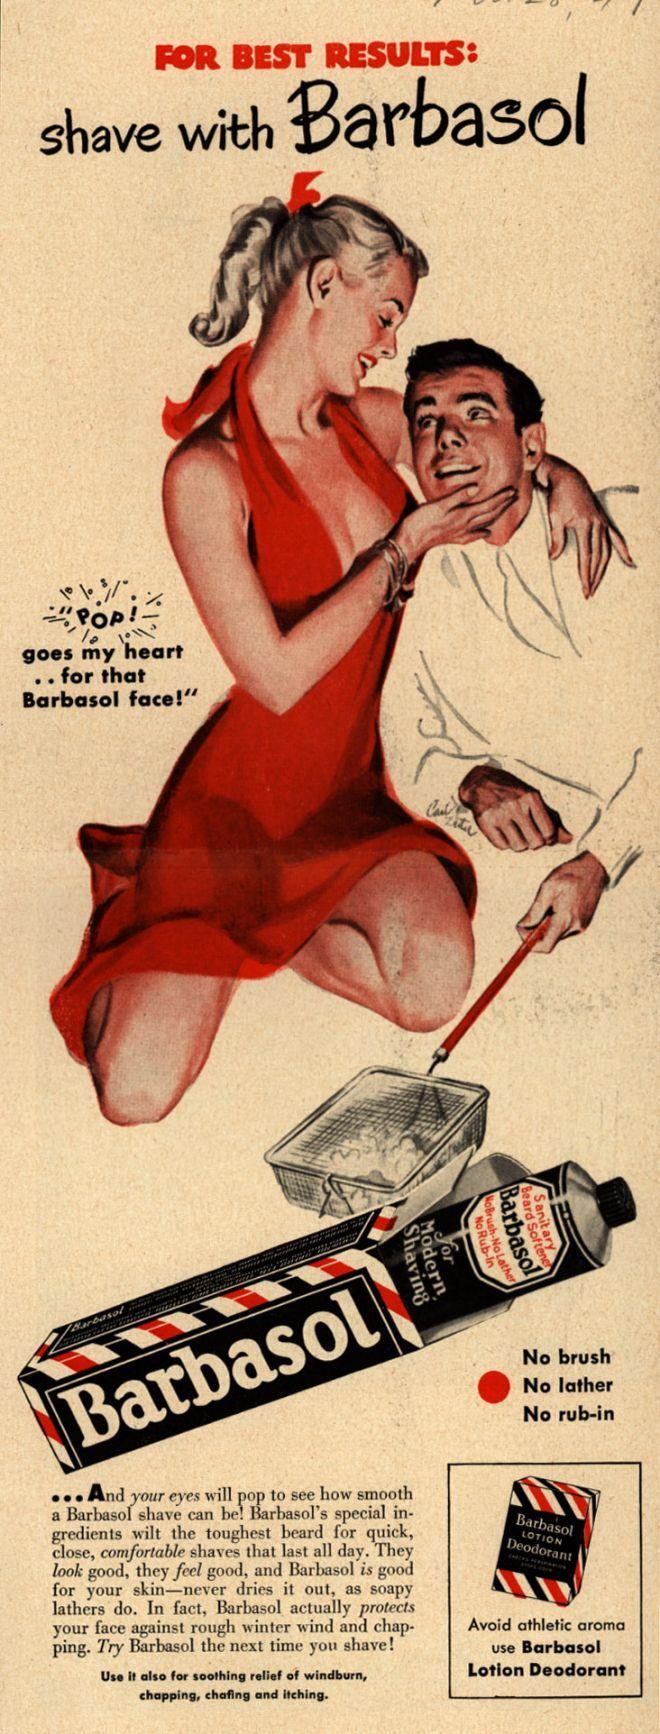 Vintage bathroom ads - Barbasol Shaving Cream 1948 Pin Up Girl What Mad Men Art The Vintage Advertisement Art Collection